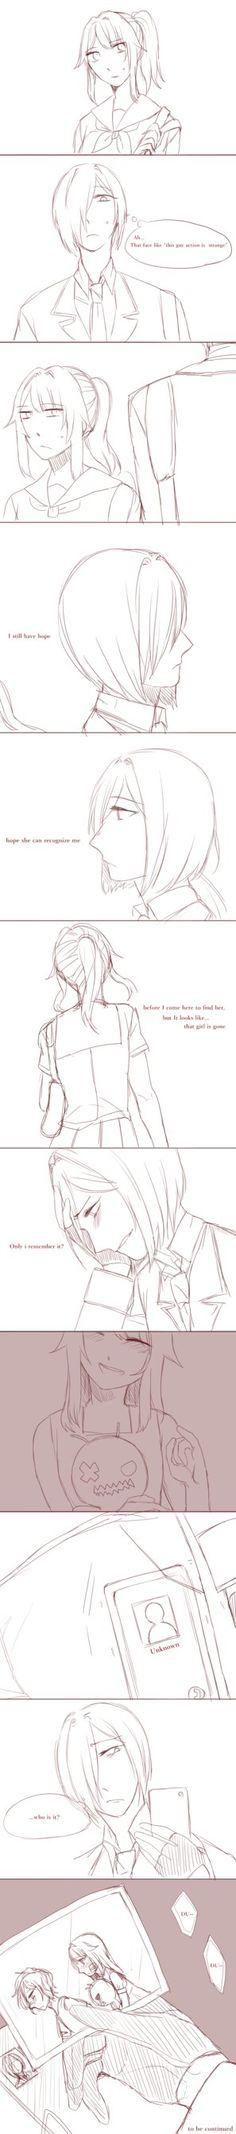 'who are you'-9 by Koumi-senpai.deviantart.com on @DeviantArt